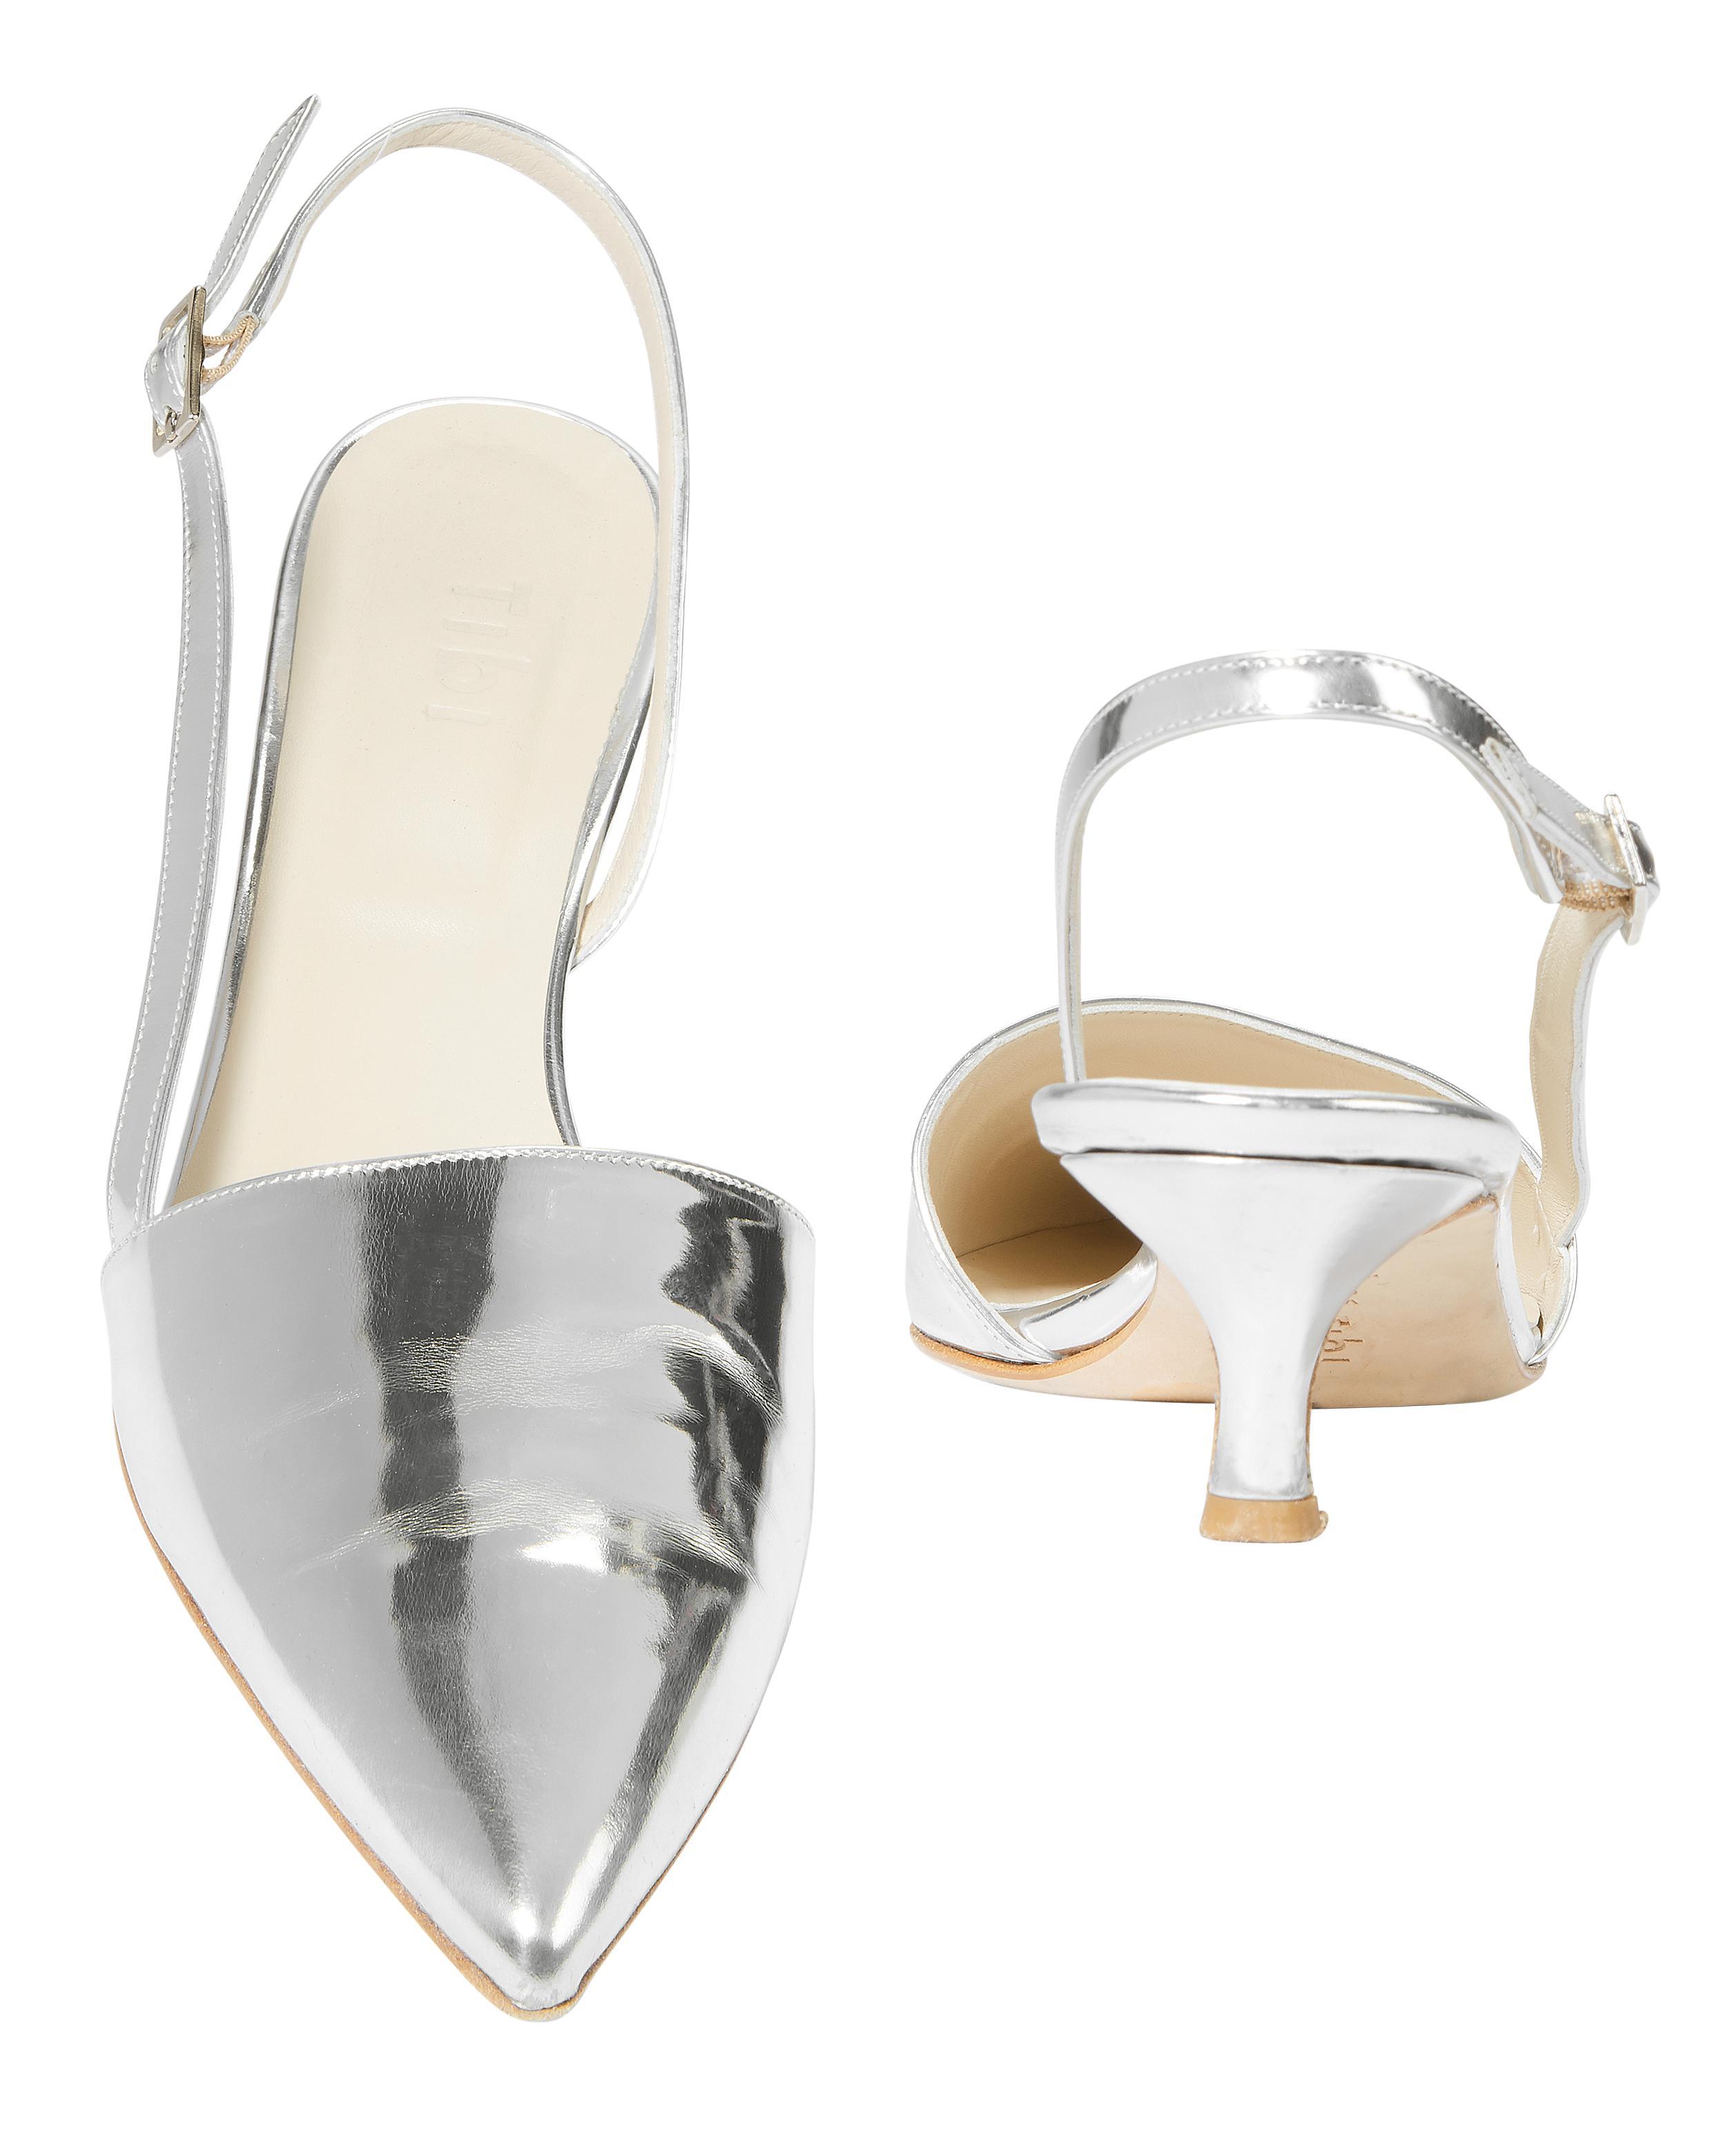 83f12d919d6 Lyst - Tibi Simon Slingback Kitten Heels in Metallic